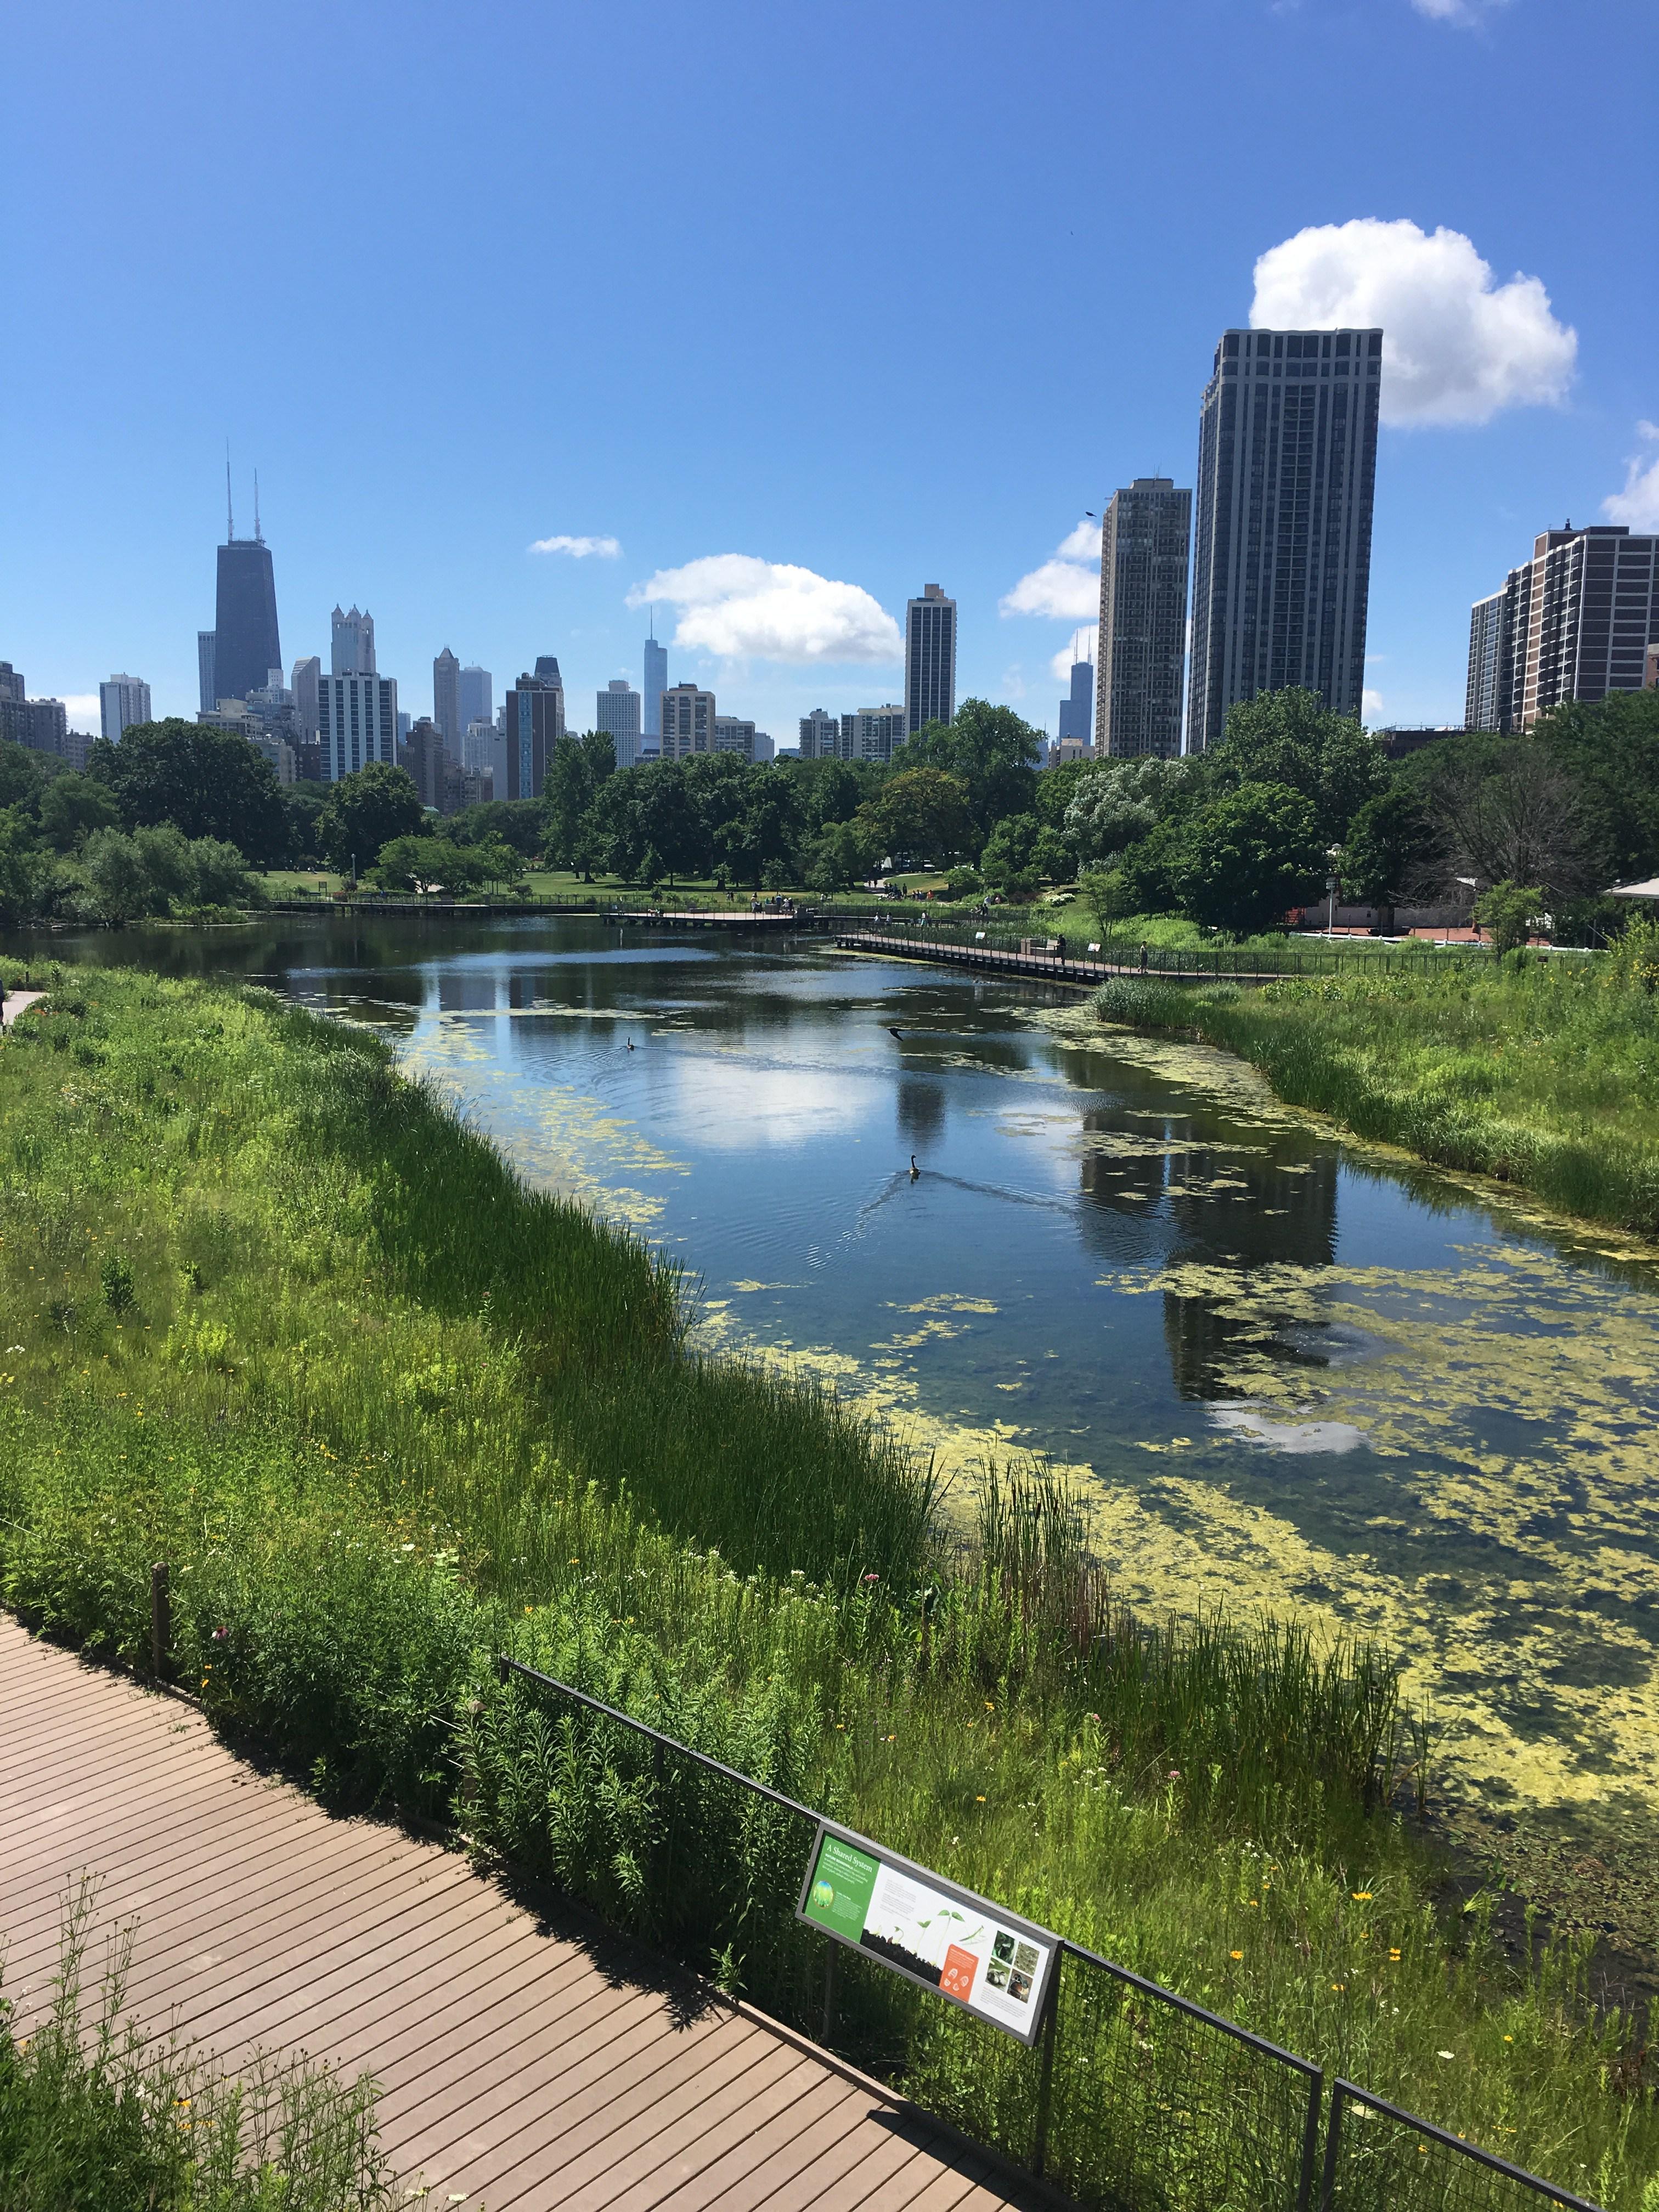 Chicago - Danielle